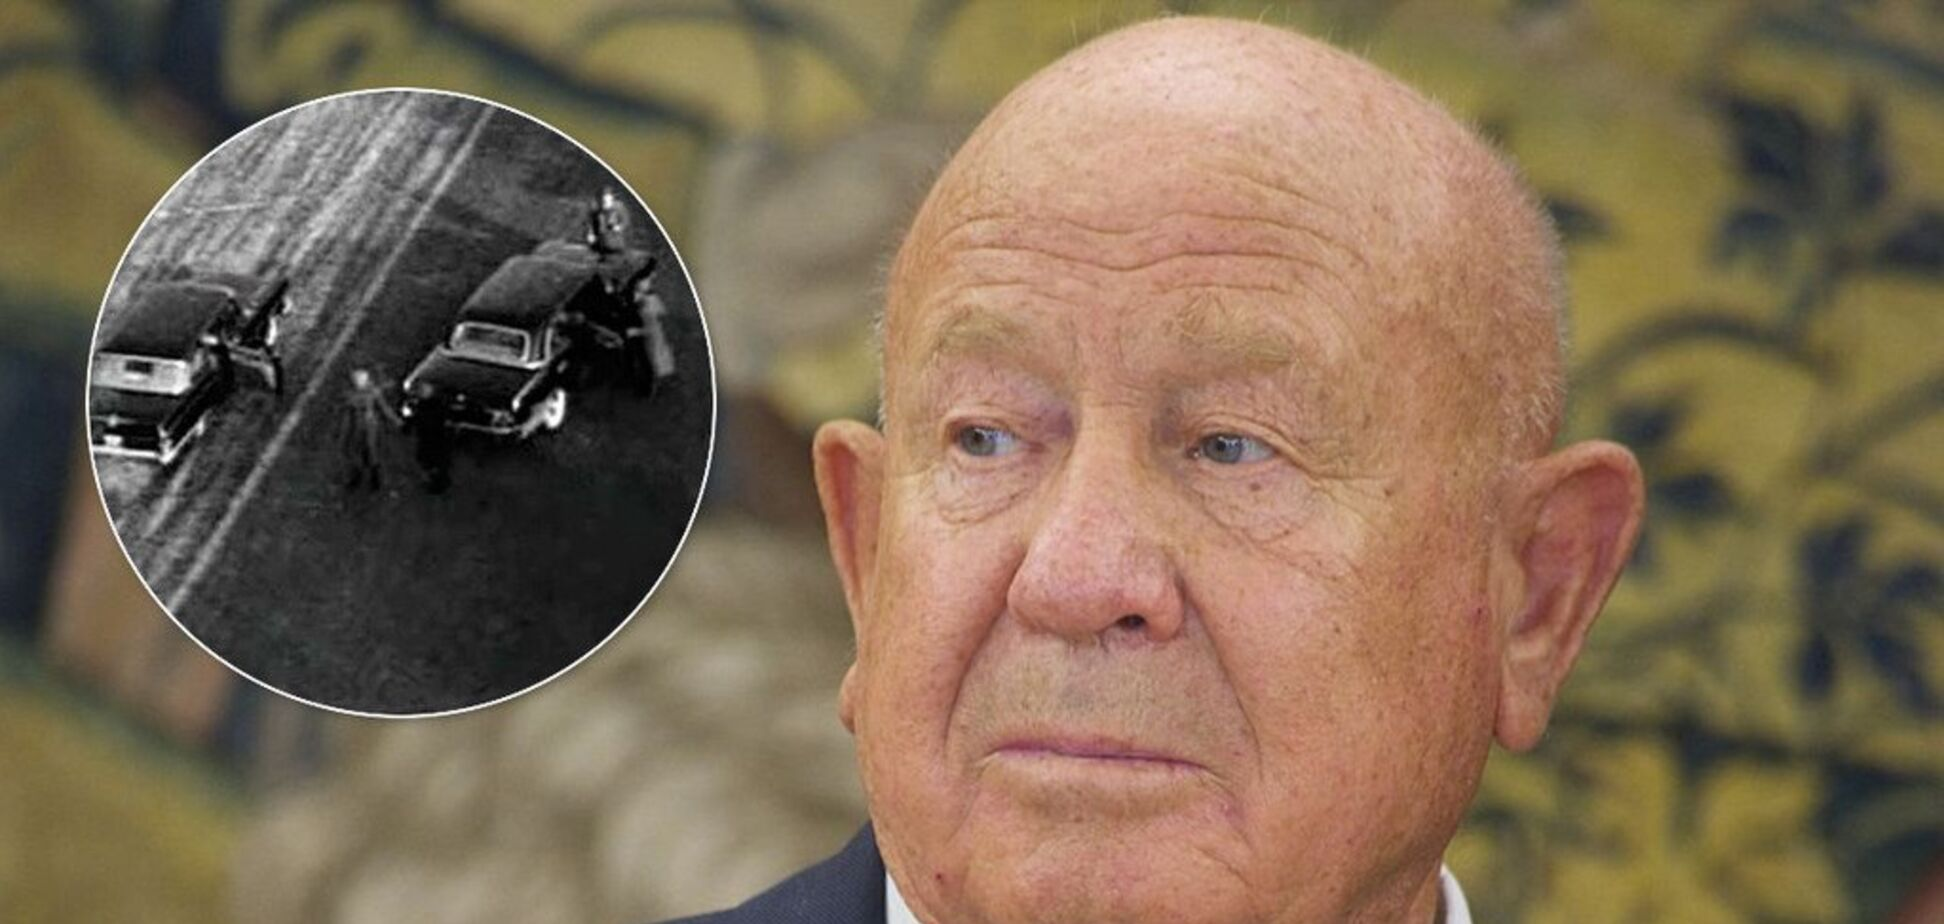 Спас Брежнева от пули, мог разбиться на 'Союзе': как космонавт Леонов уходил от смерти